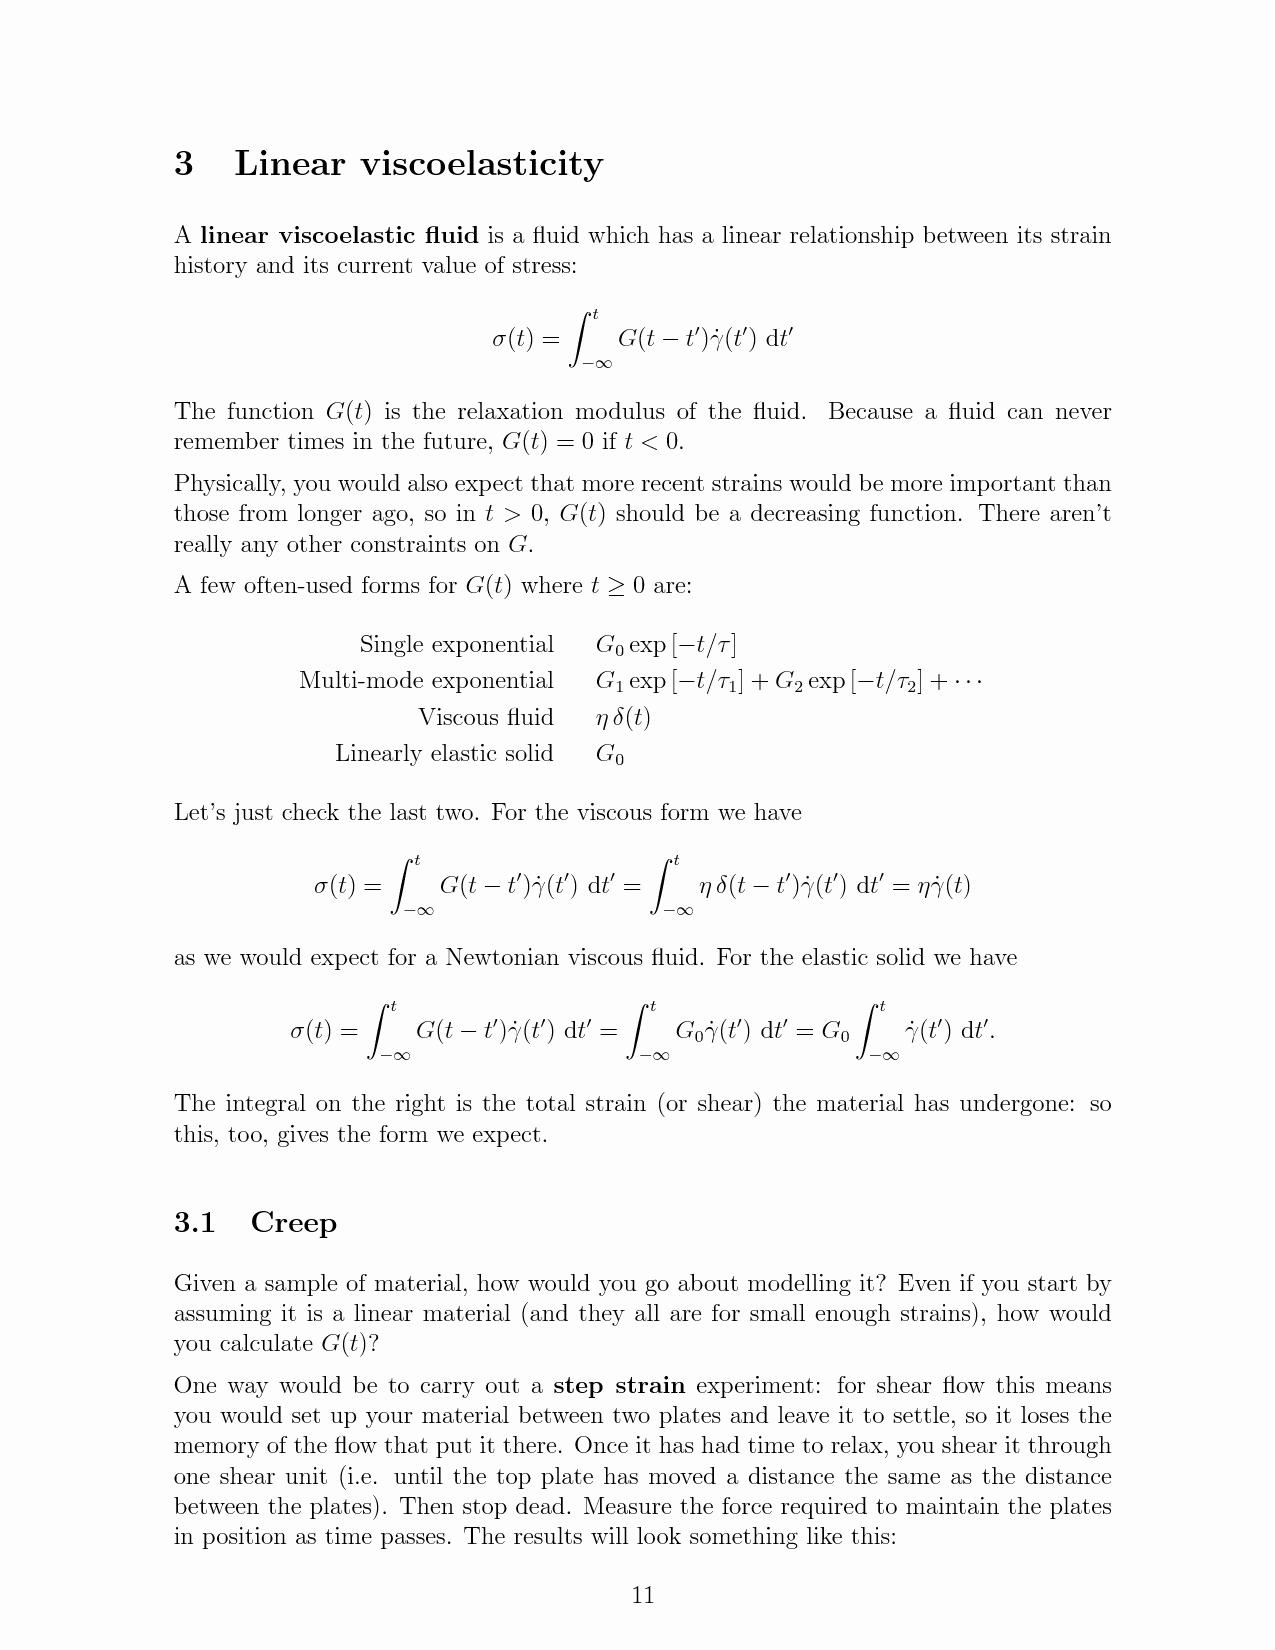 Linear Equation Word Problems Worksheet Unique 17 Best Of Linear Function Word Problems Worksheet